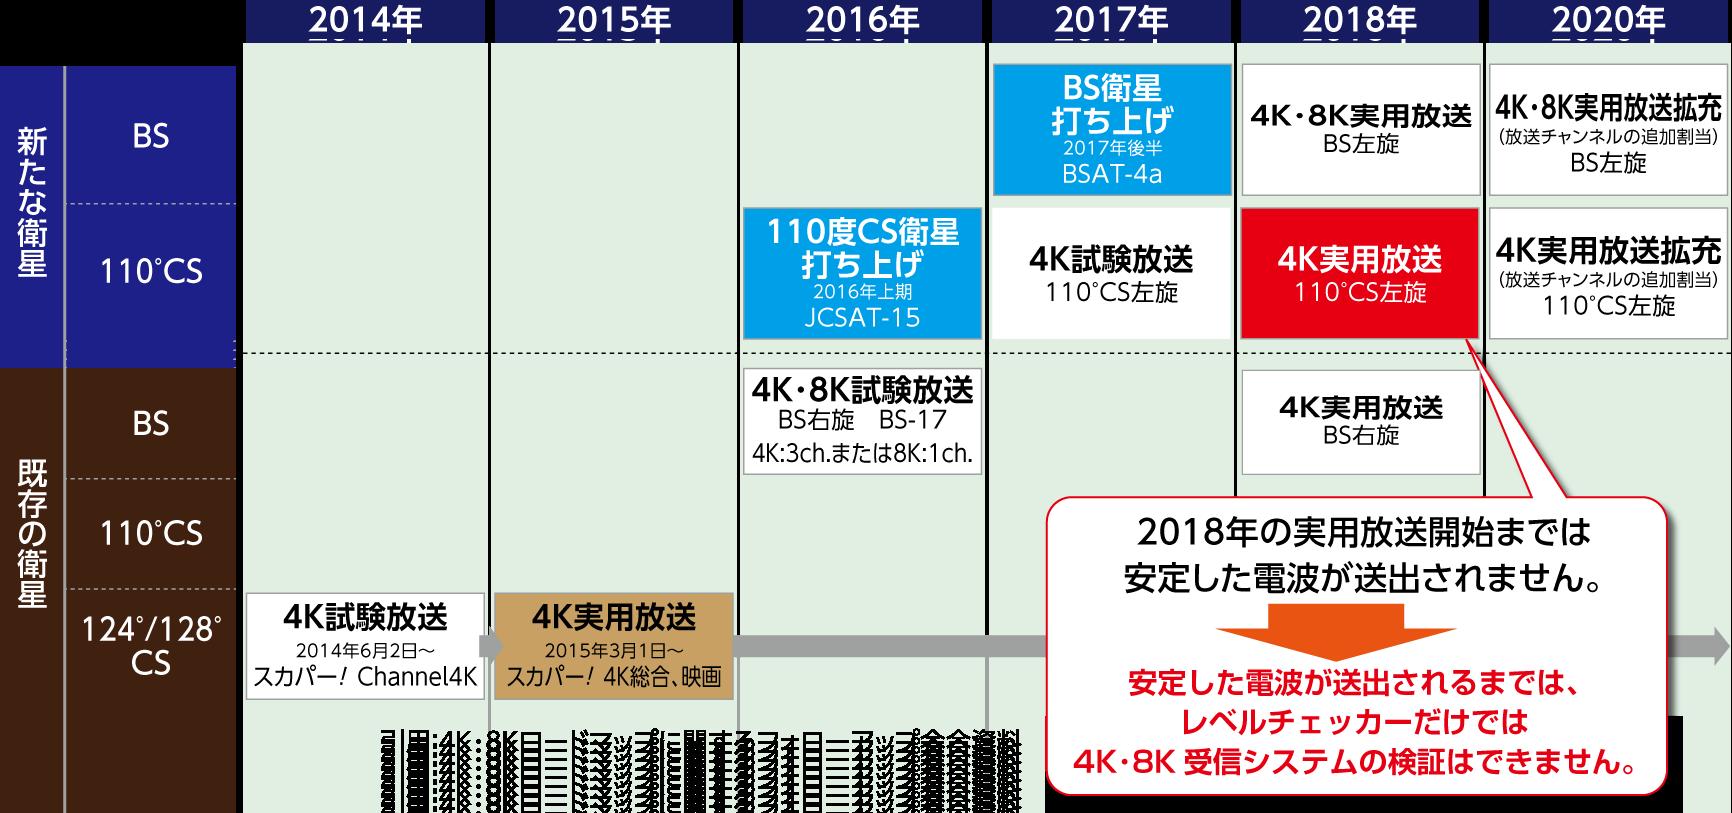 4K・8K放送のロードマップ